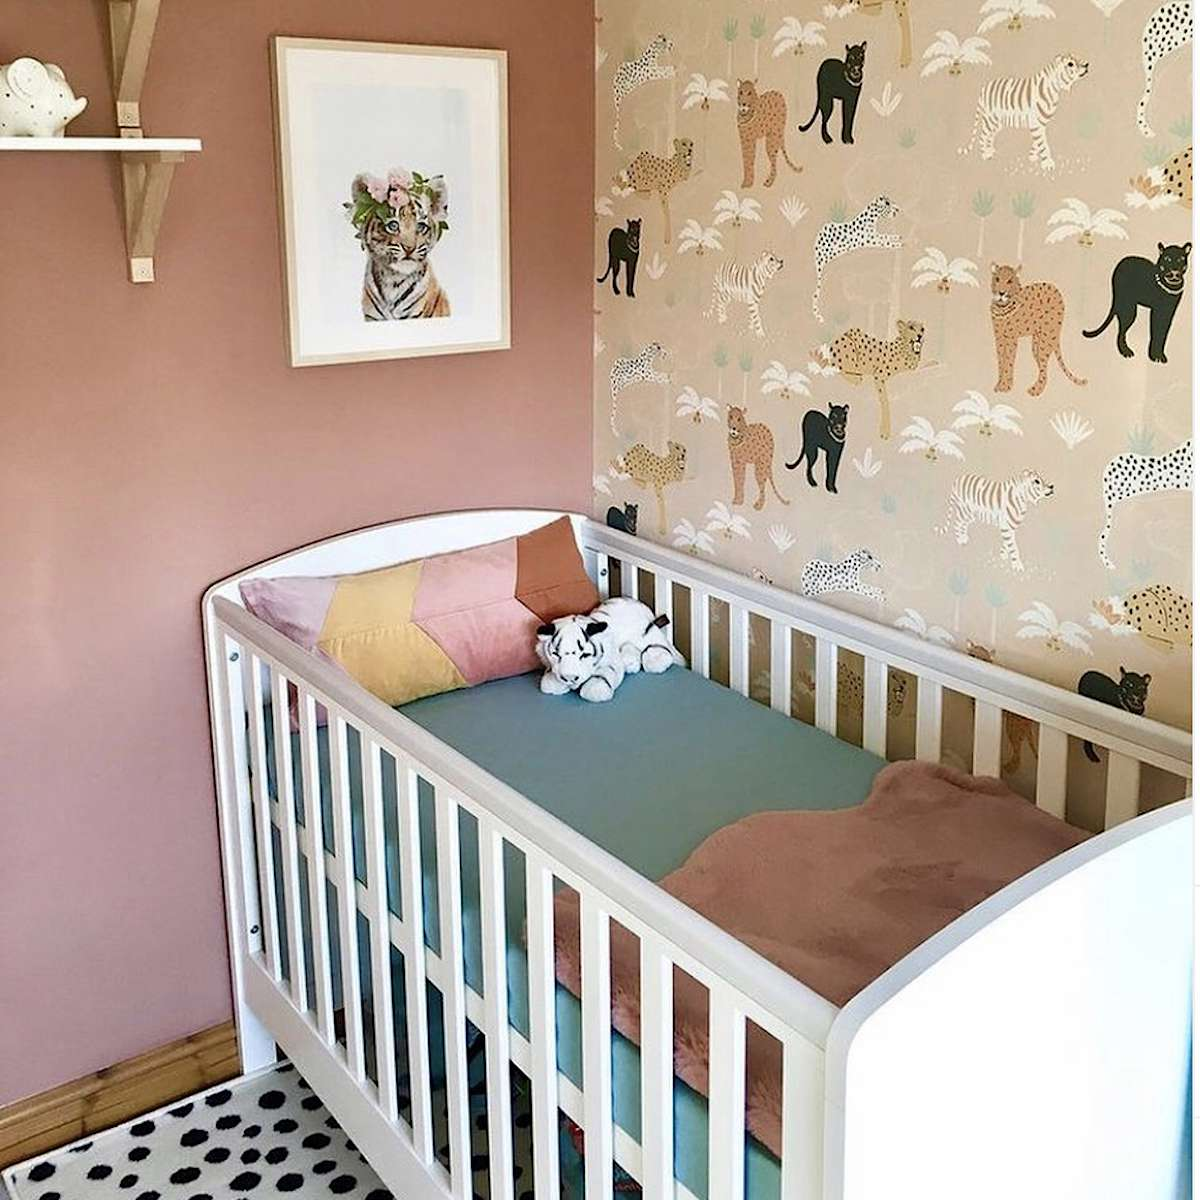 jungle theme nursery with peach wall and white crib